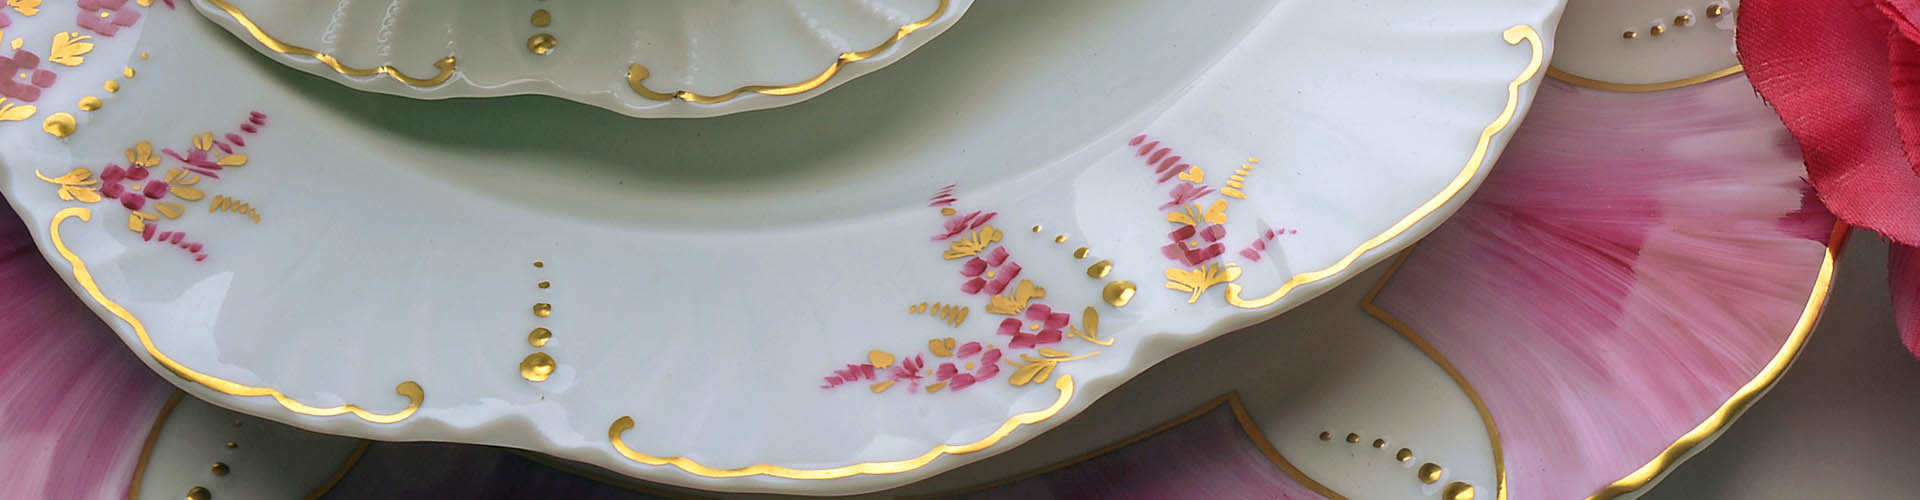 Ceramica Limoges Prezzi.Baroni Porcellane Porcellana Di Limoges Dipinta A Mano